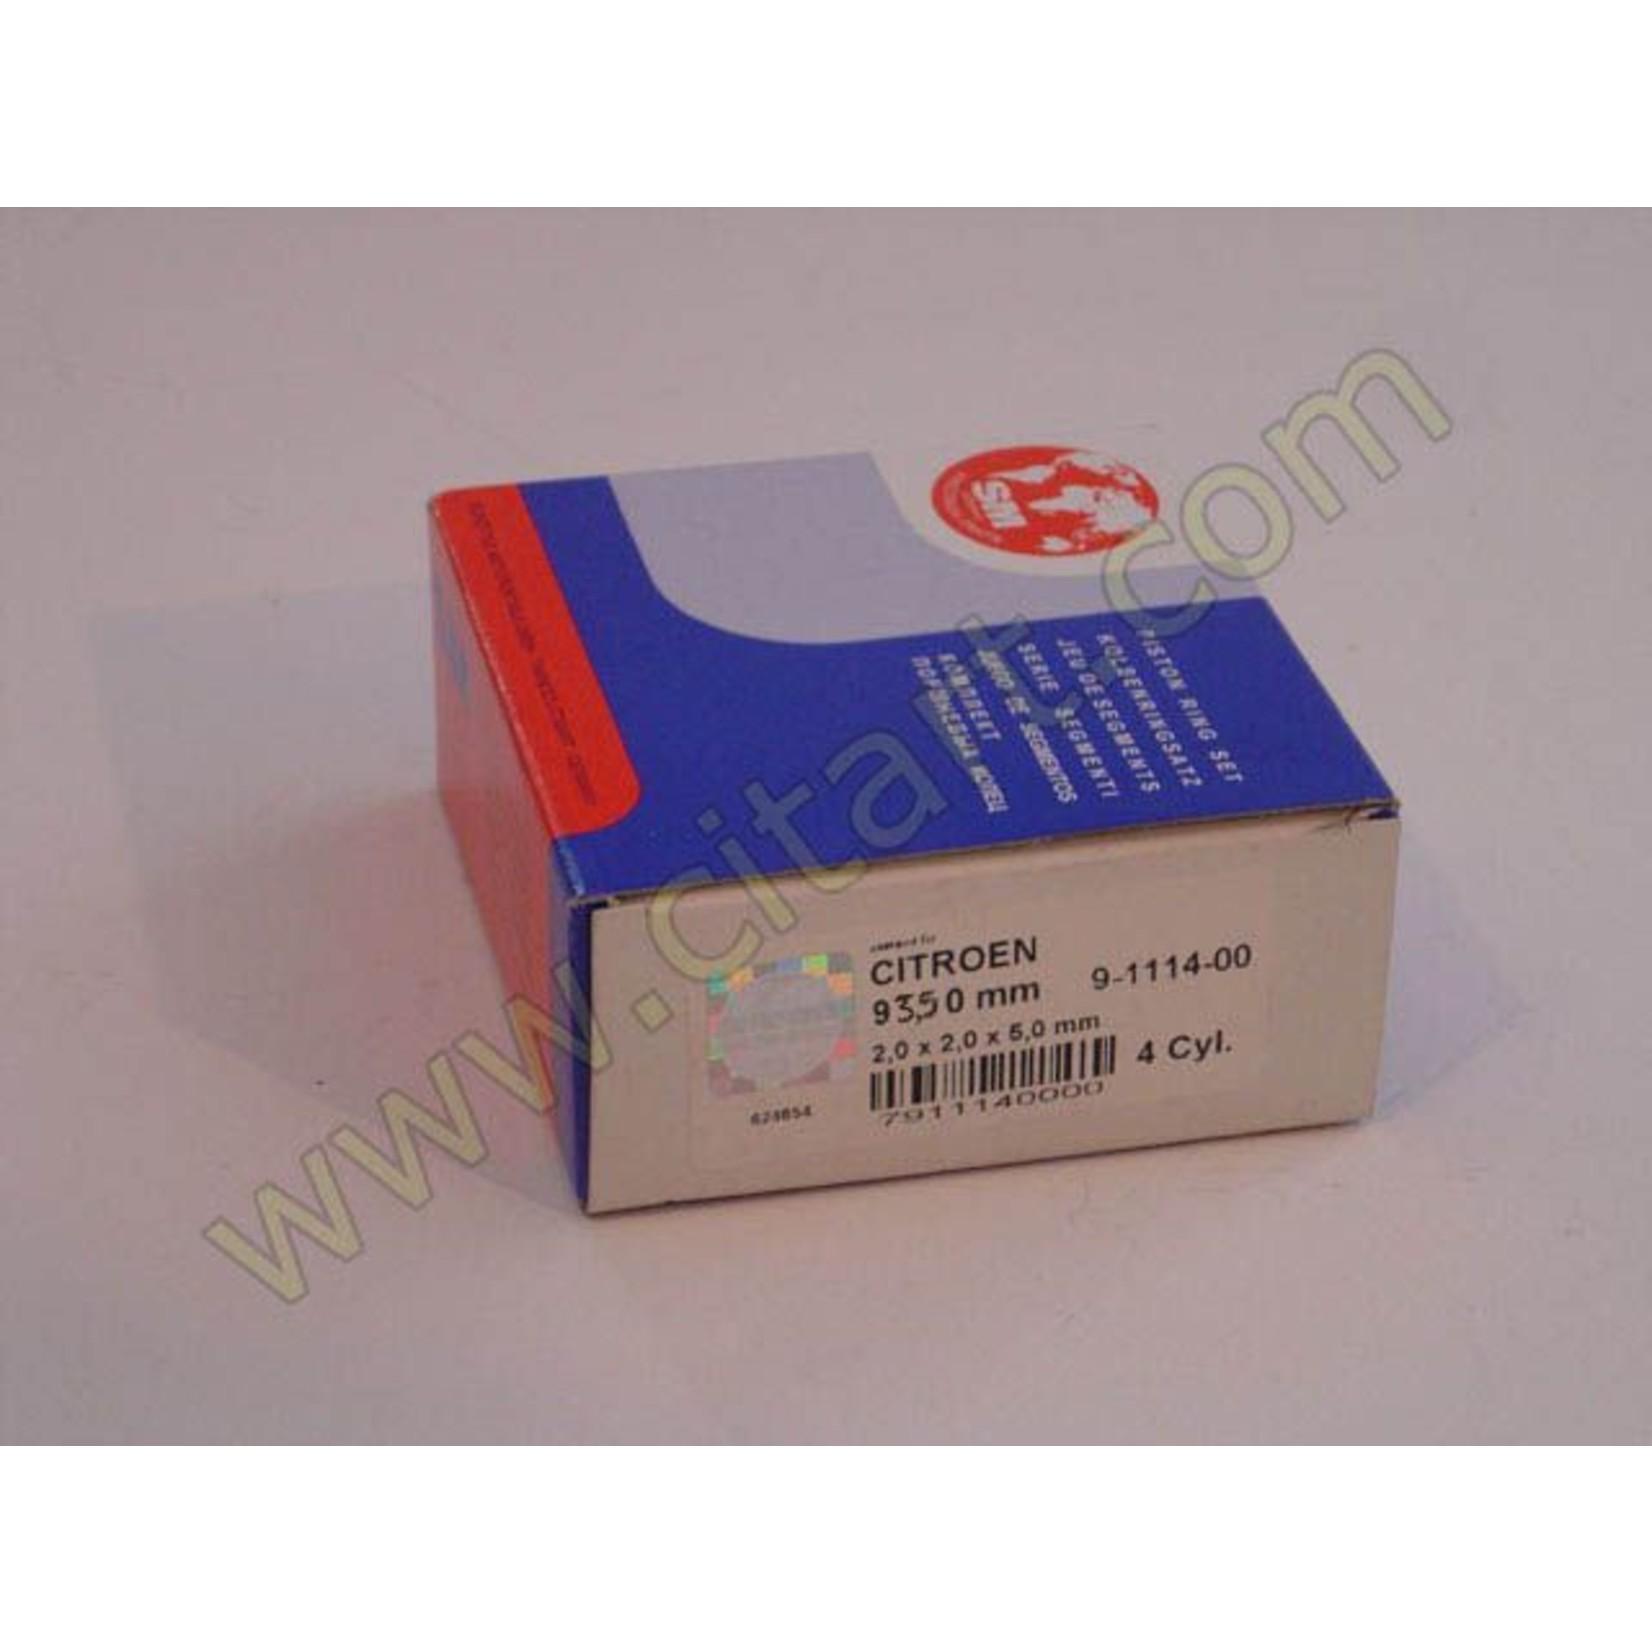 Piston rings 93,5mm Nr Org: 5421562